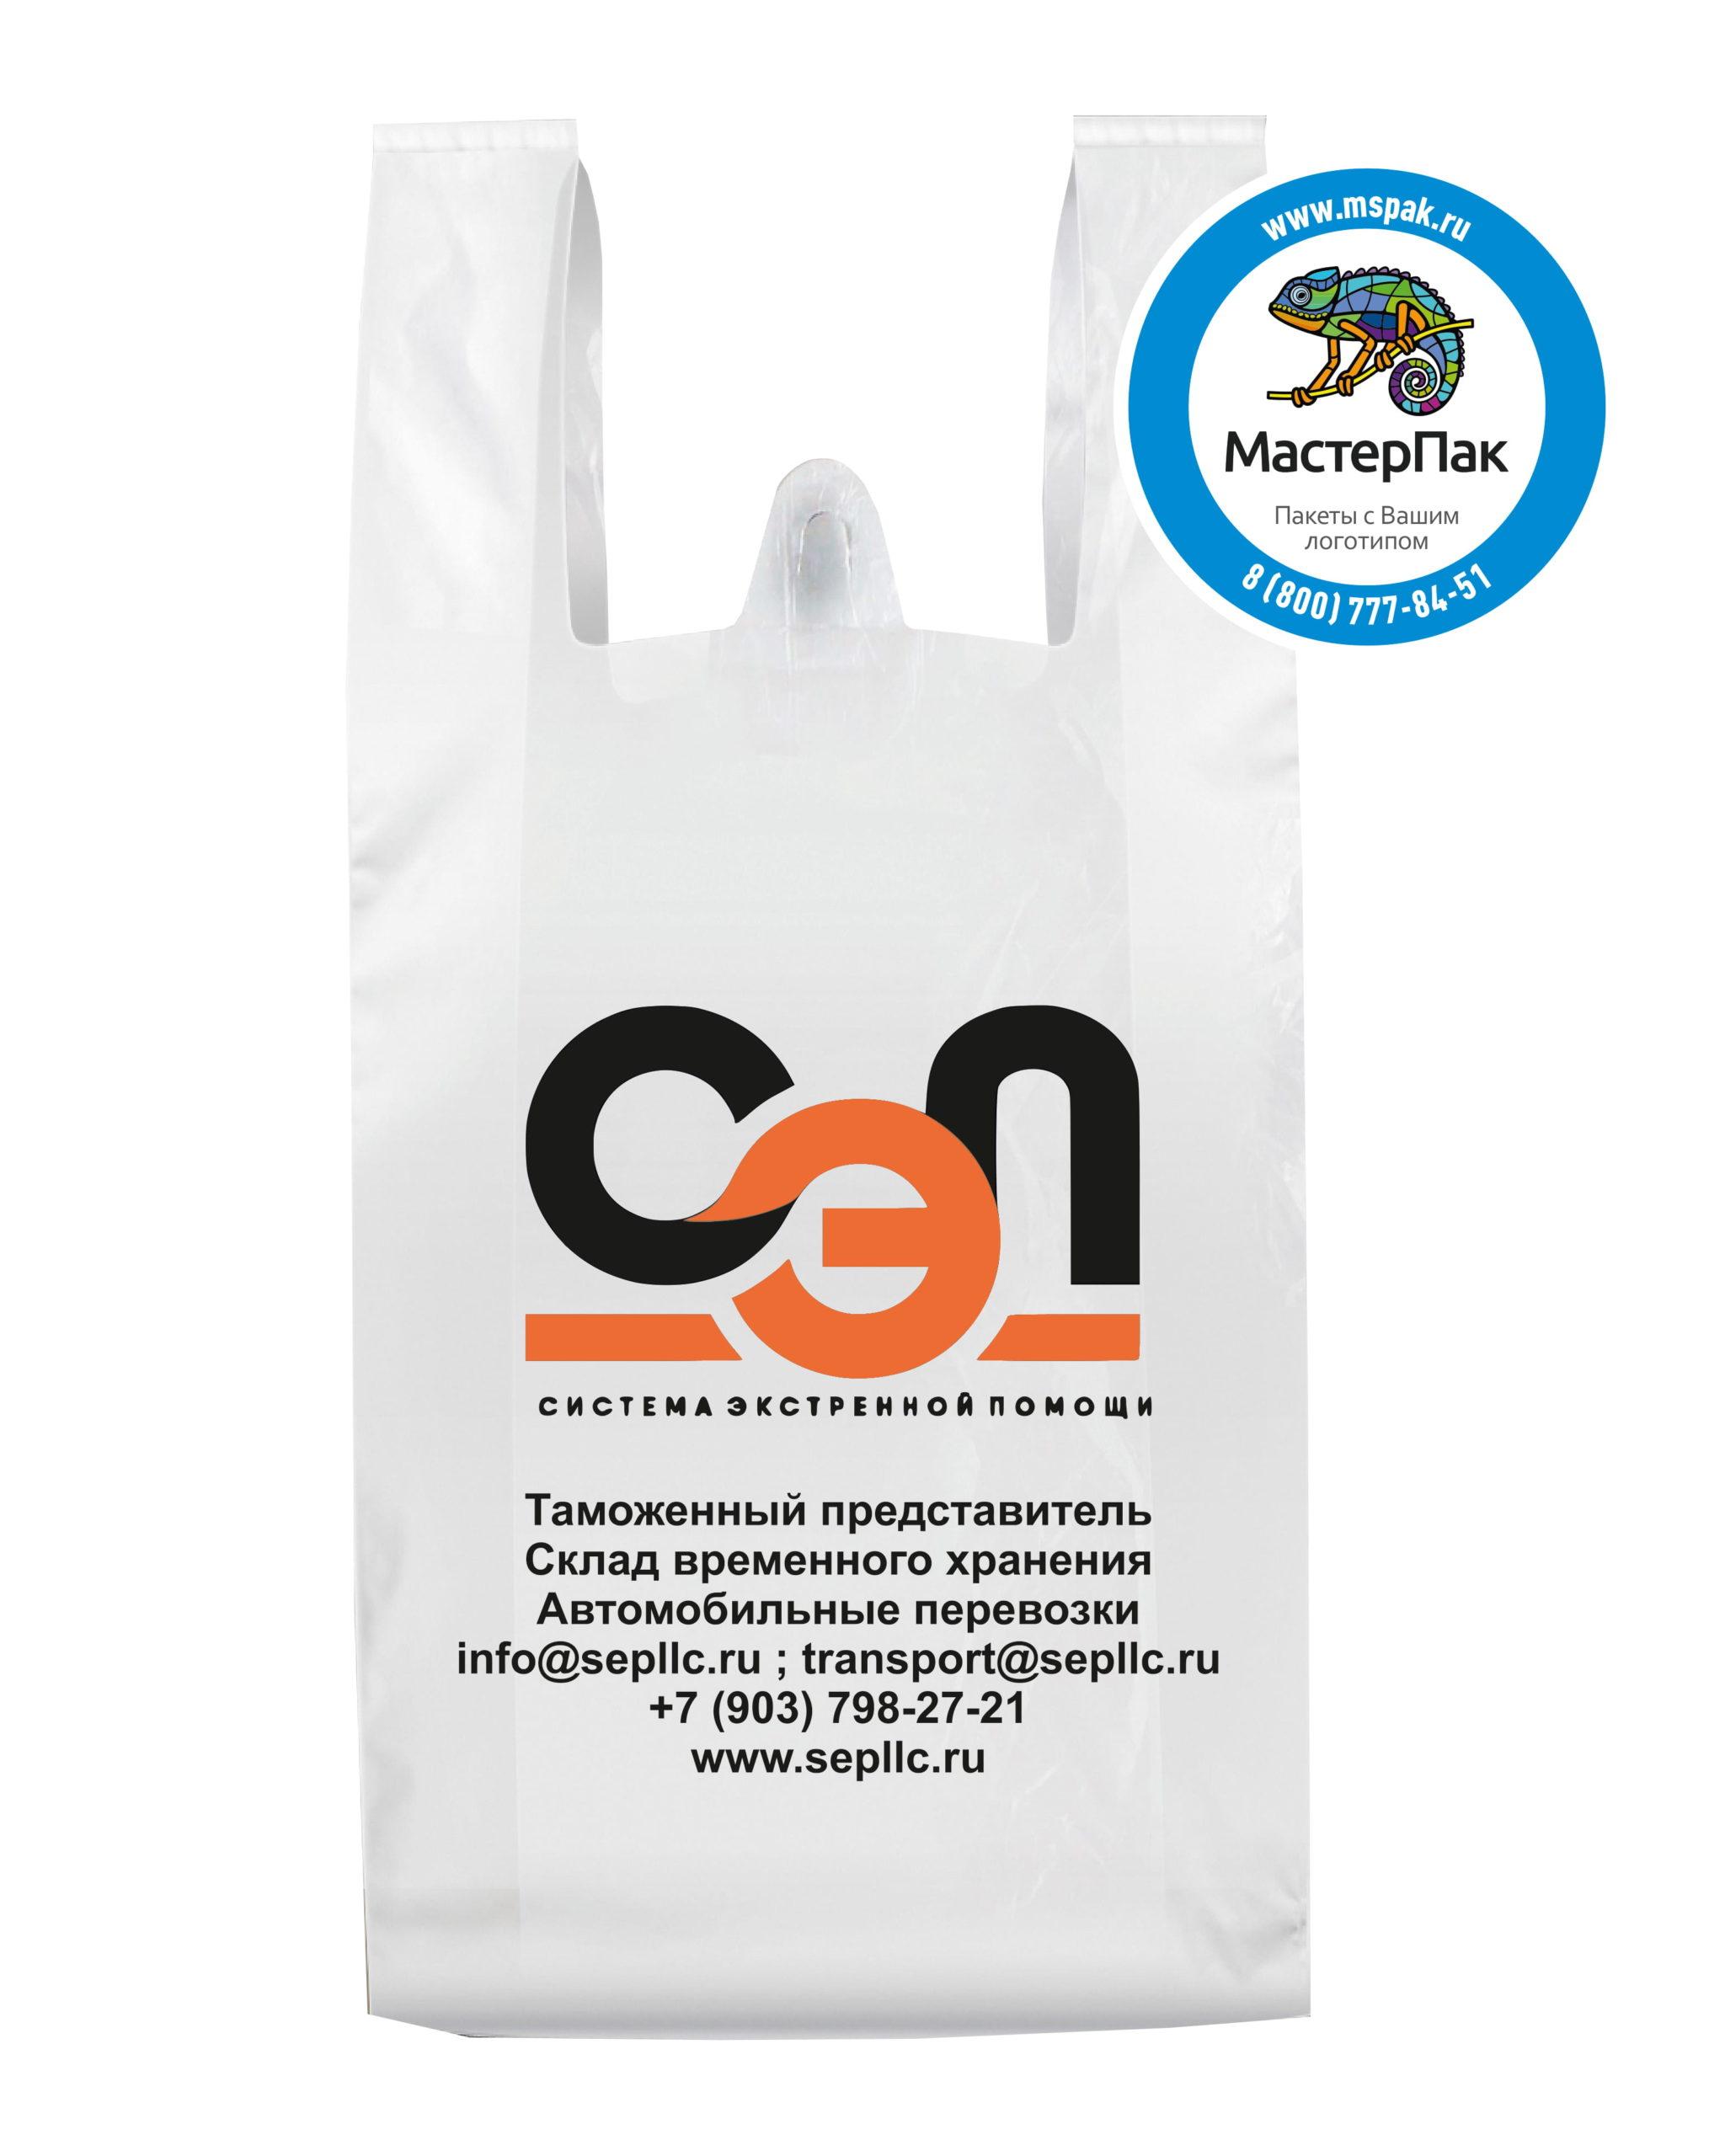 Пакет-майка ПНД, белый, с логотипом СЭП, 23 мкм, 30*60